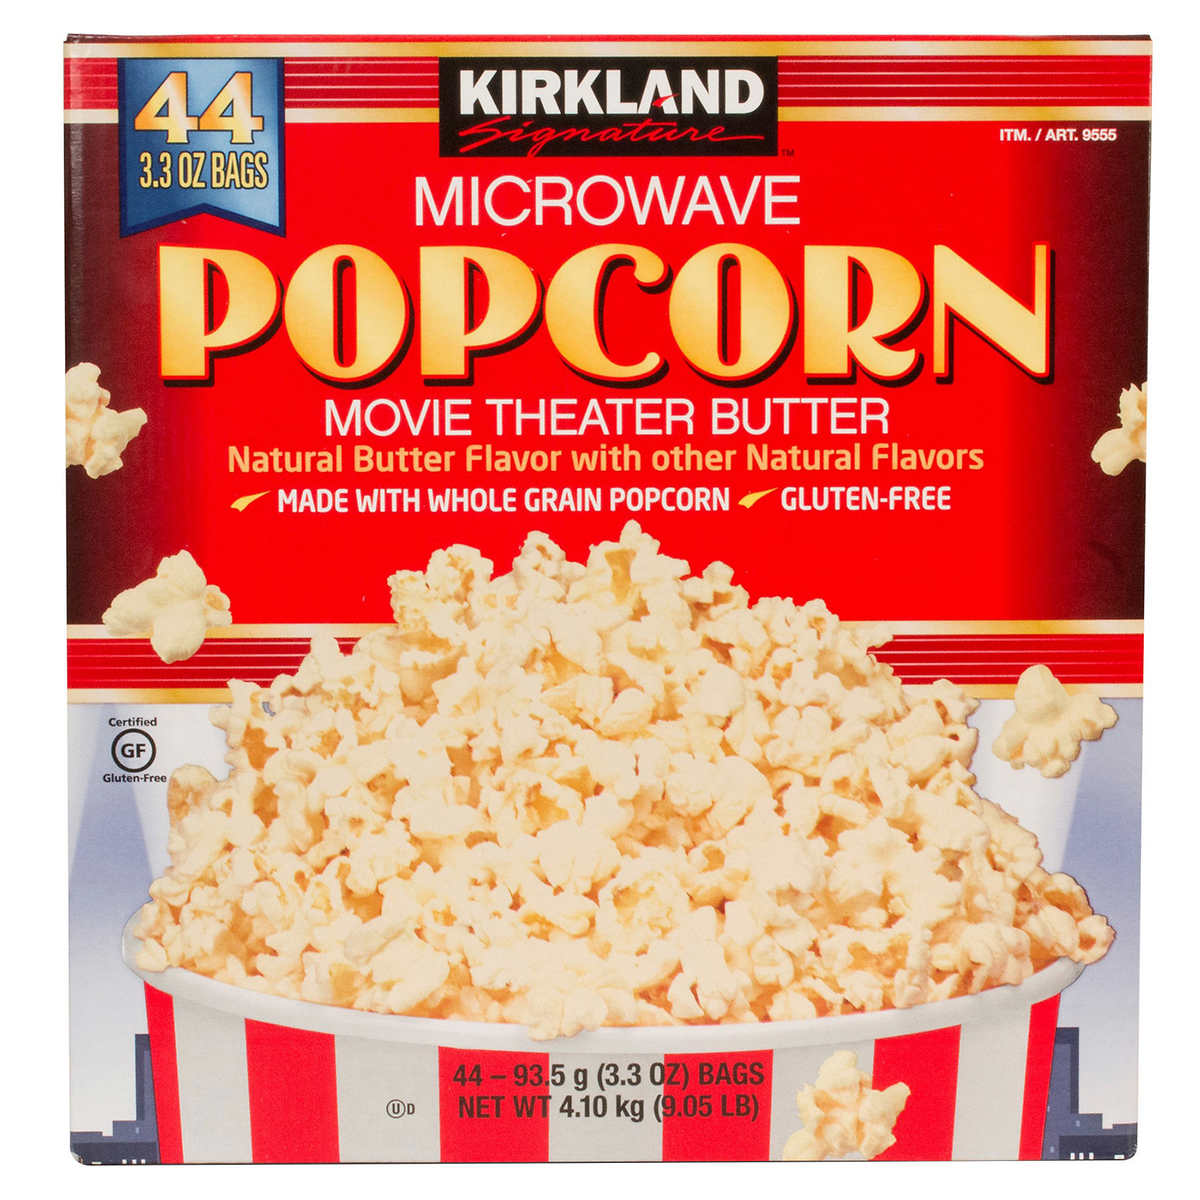 Kirkland Signature Microwave Popcorn 3 3 Oz 44 Count